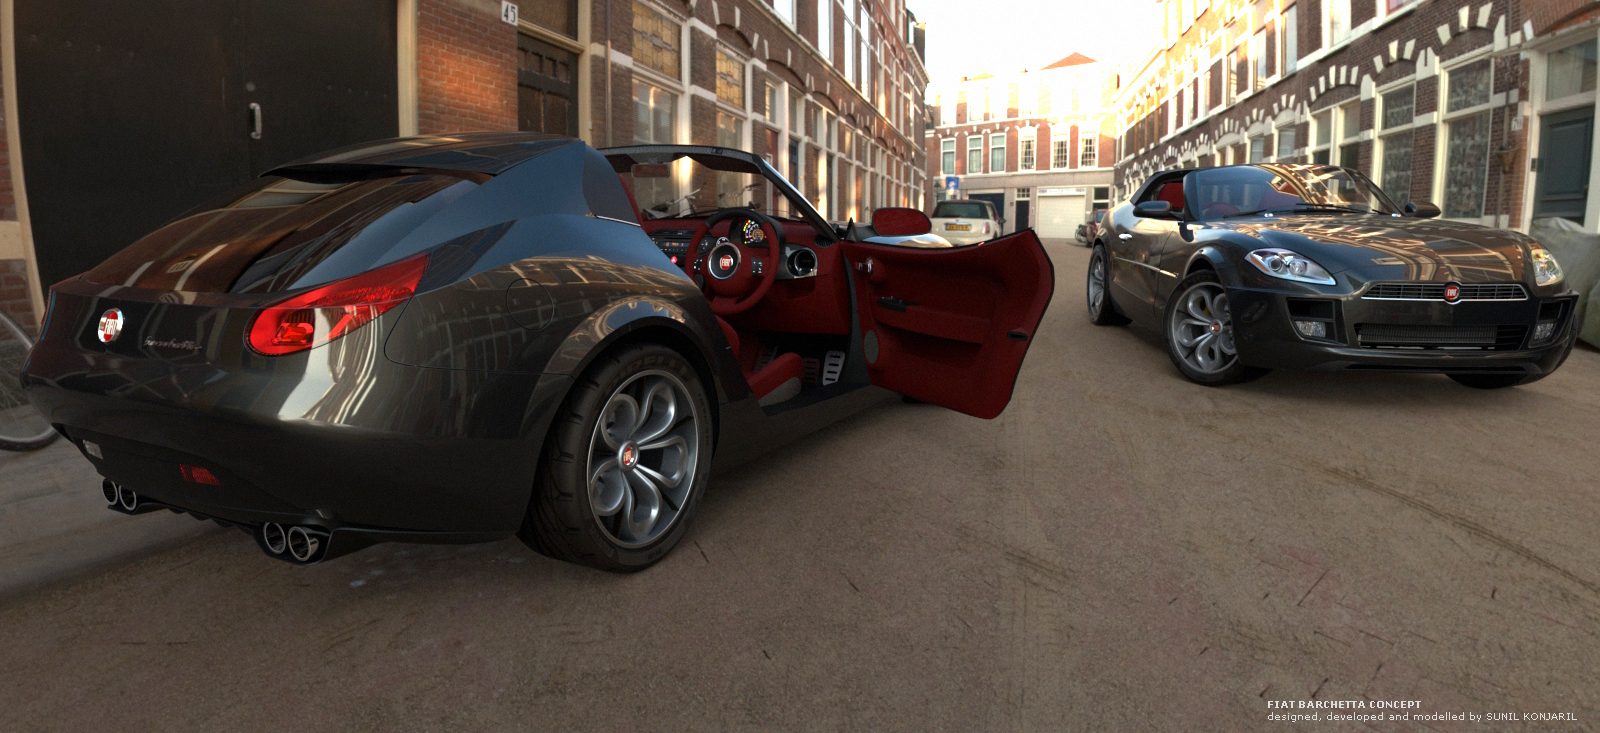 Fiat Barchetta modern generation 3d art